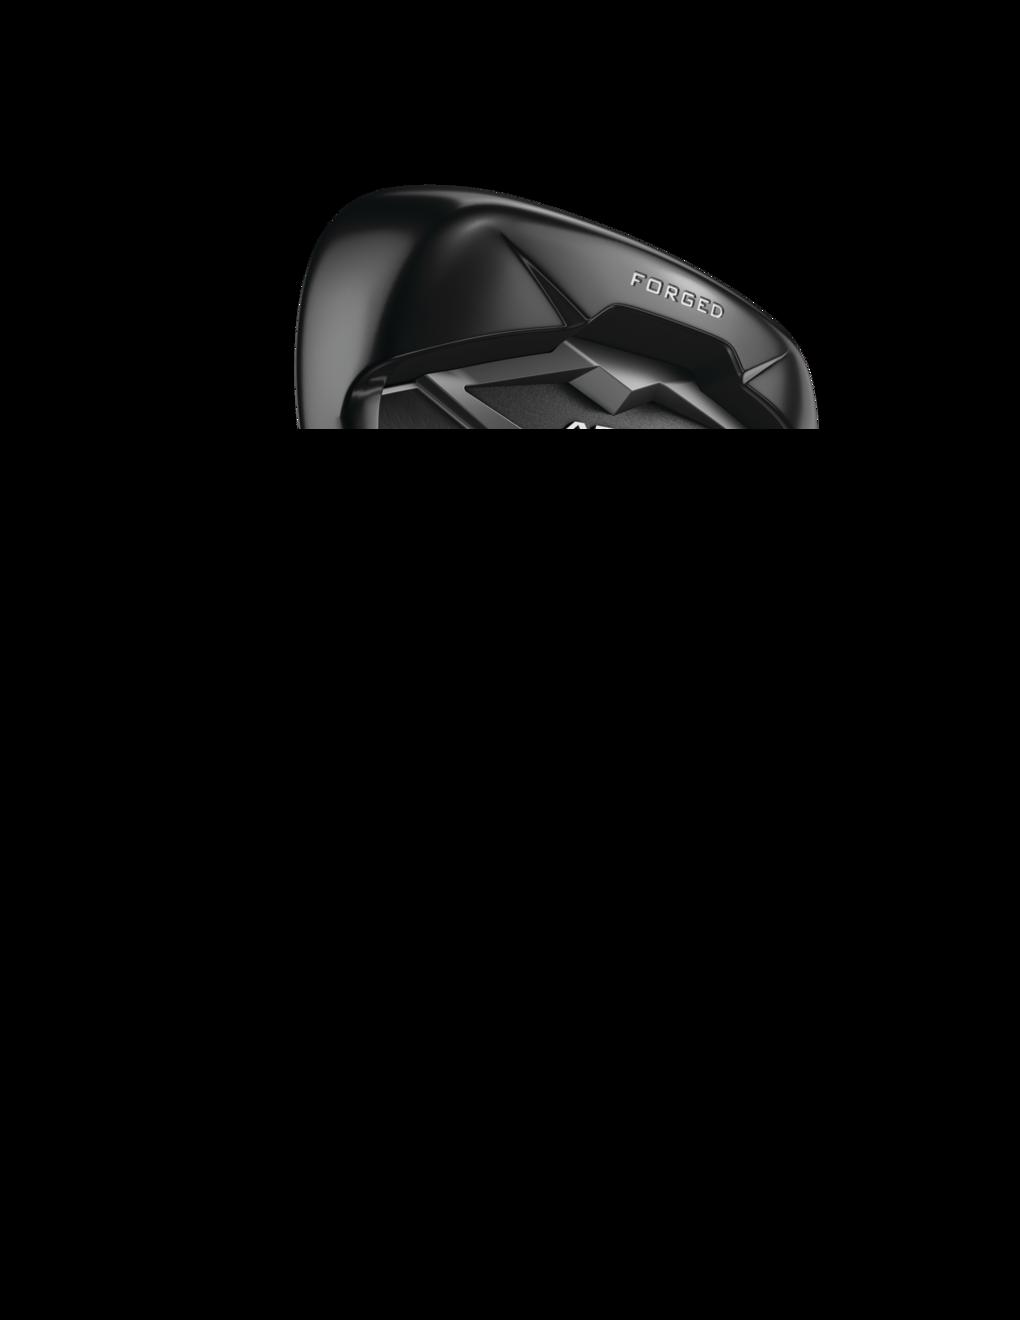 Callaway 2019 Apex Smoke Irons (4-PW)